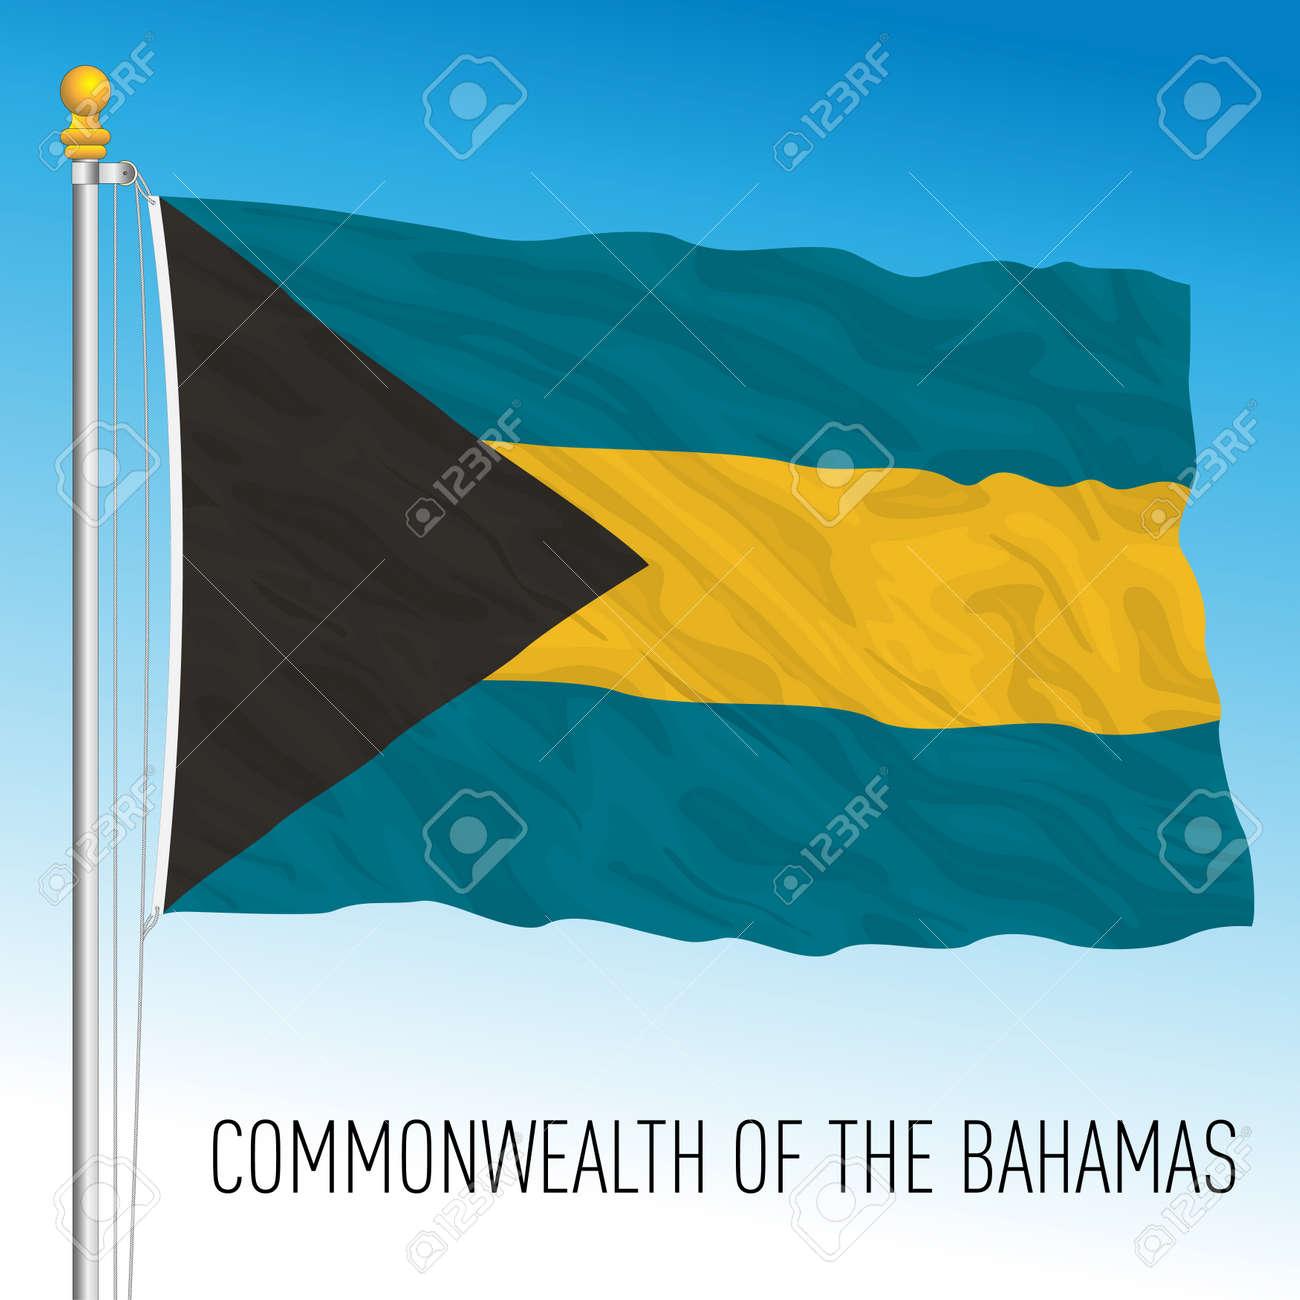 Bahamas official national flag, caribbean country, vector illustration - 167629166